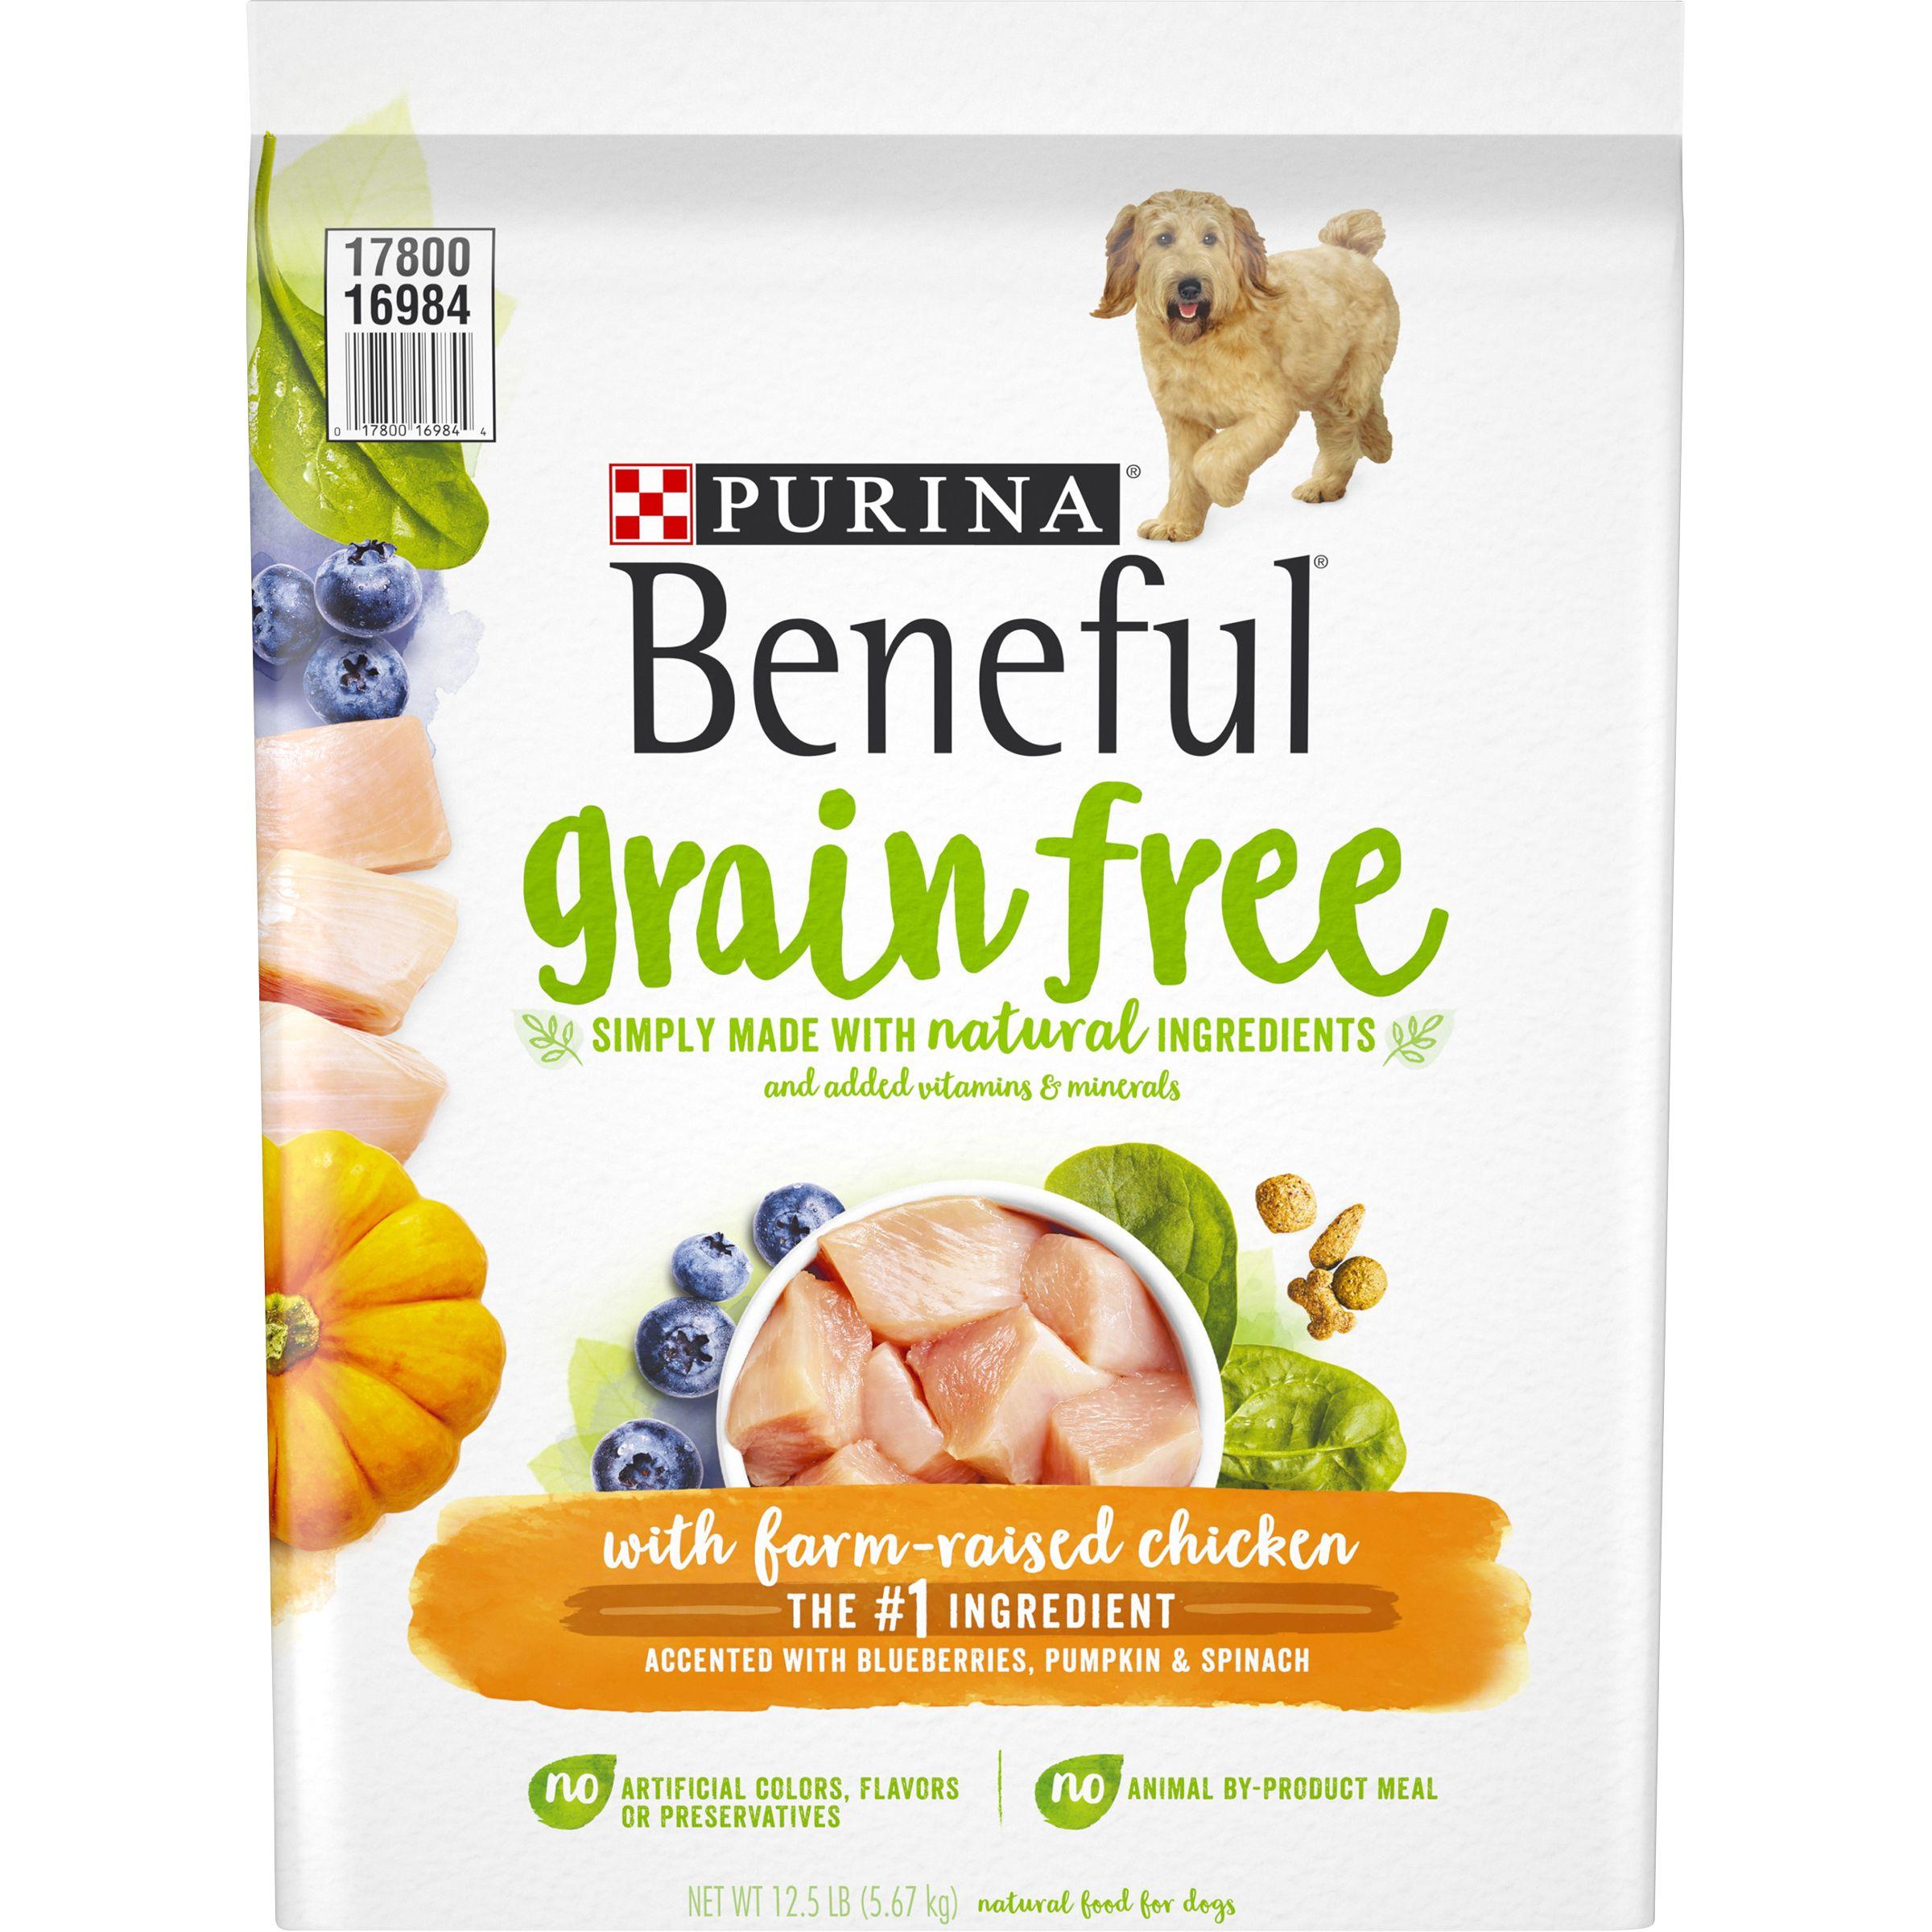 Purina® Beneful® Adult Dog Food - Grain Free, Gluten Free, Chicken size: 12.5 Lb 5264087